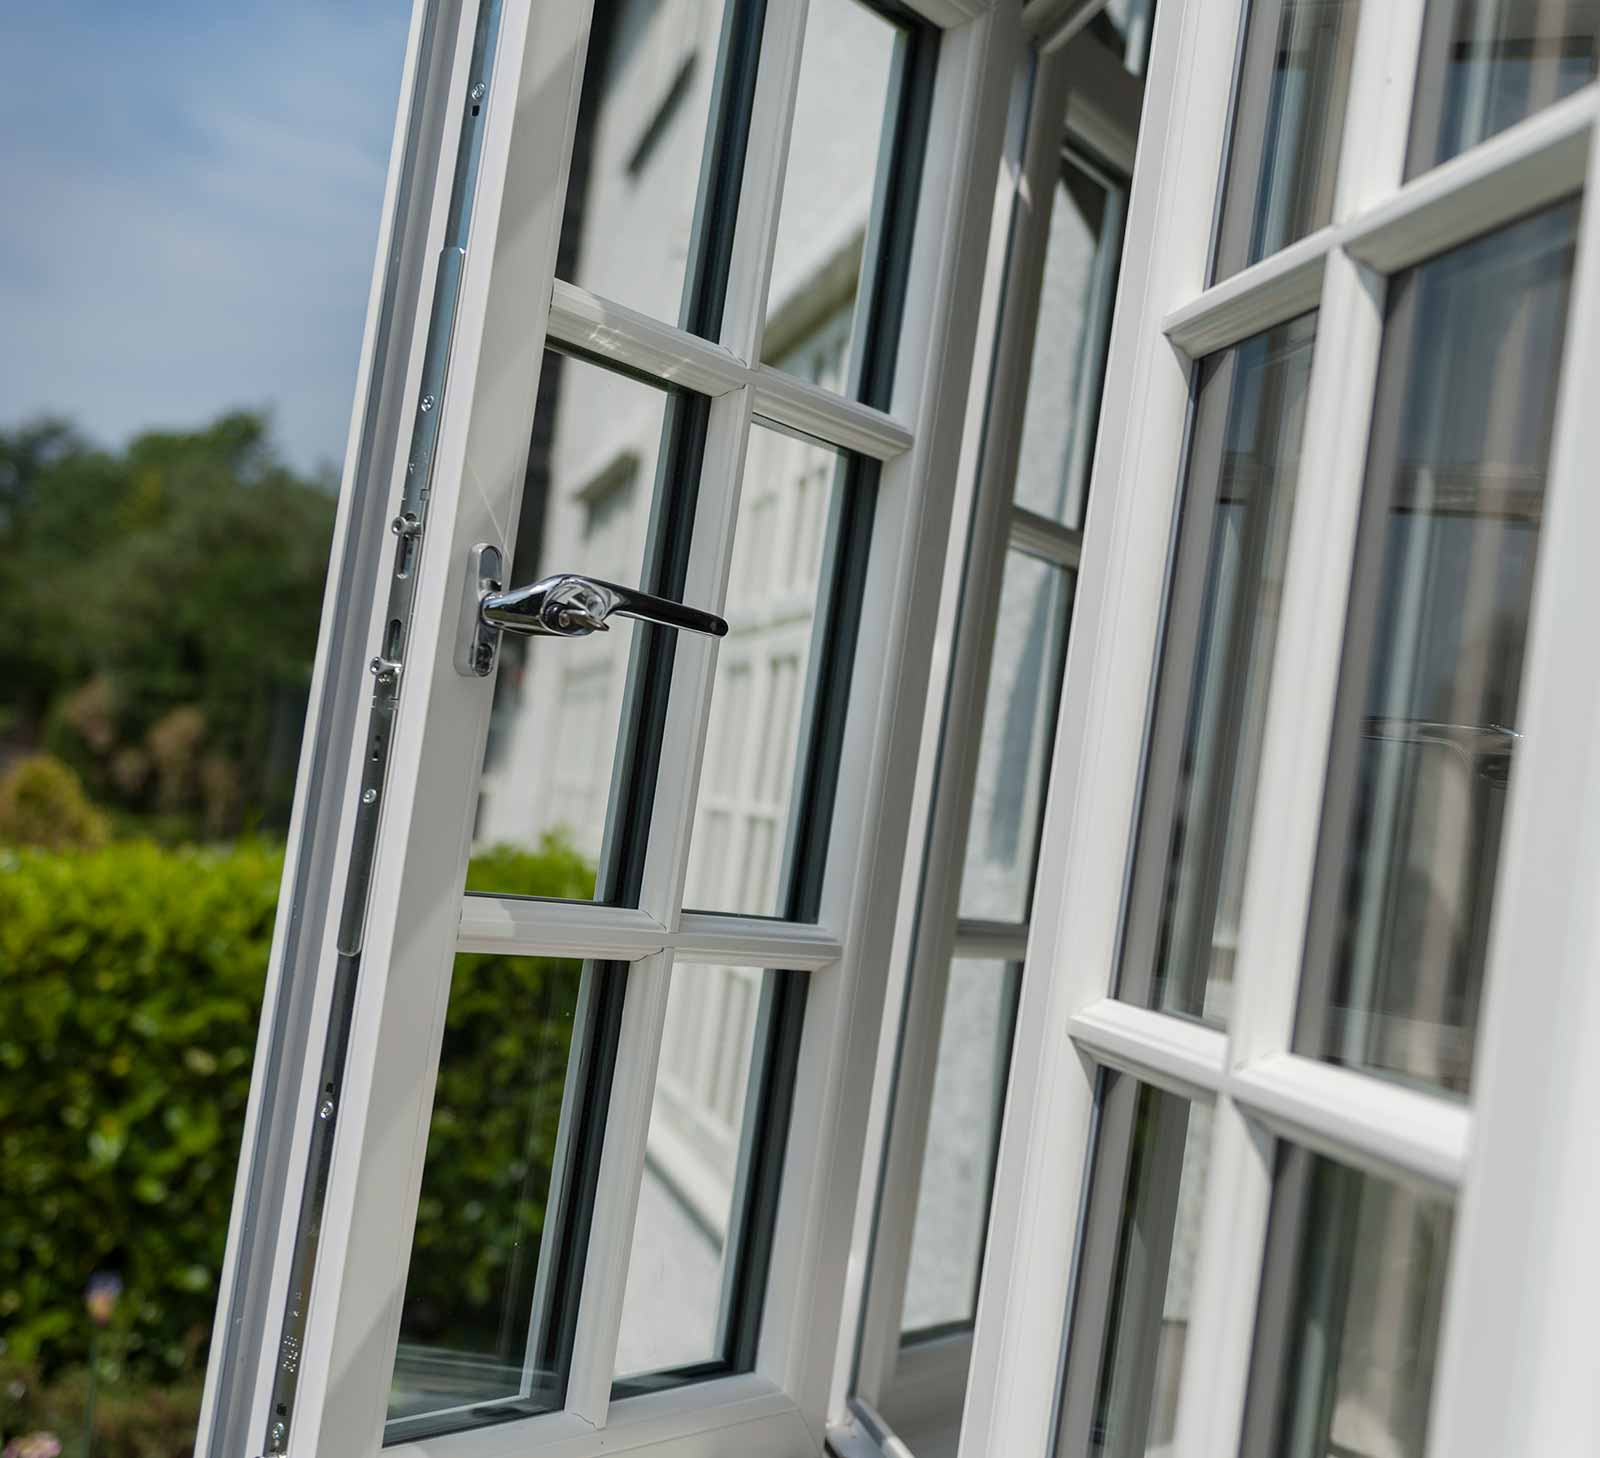 Upvc Casement Windows Clacton On Sea Casement Window